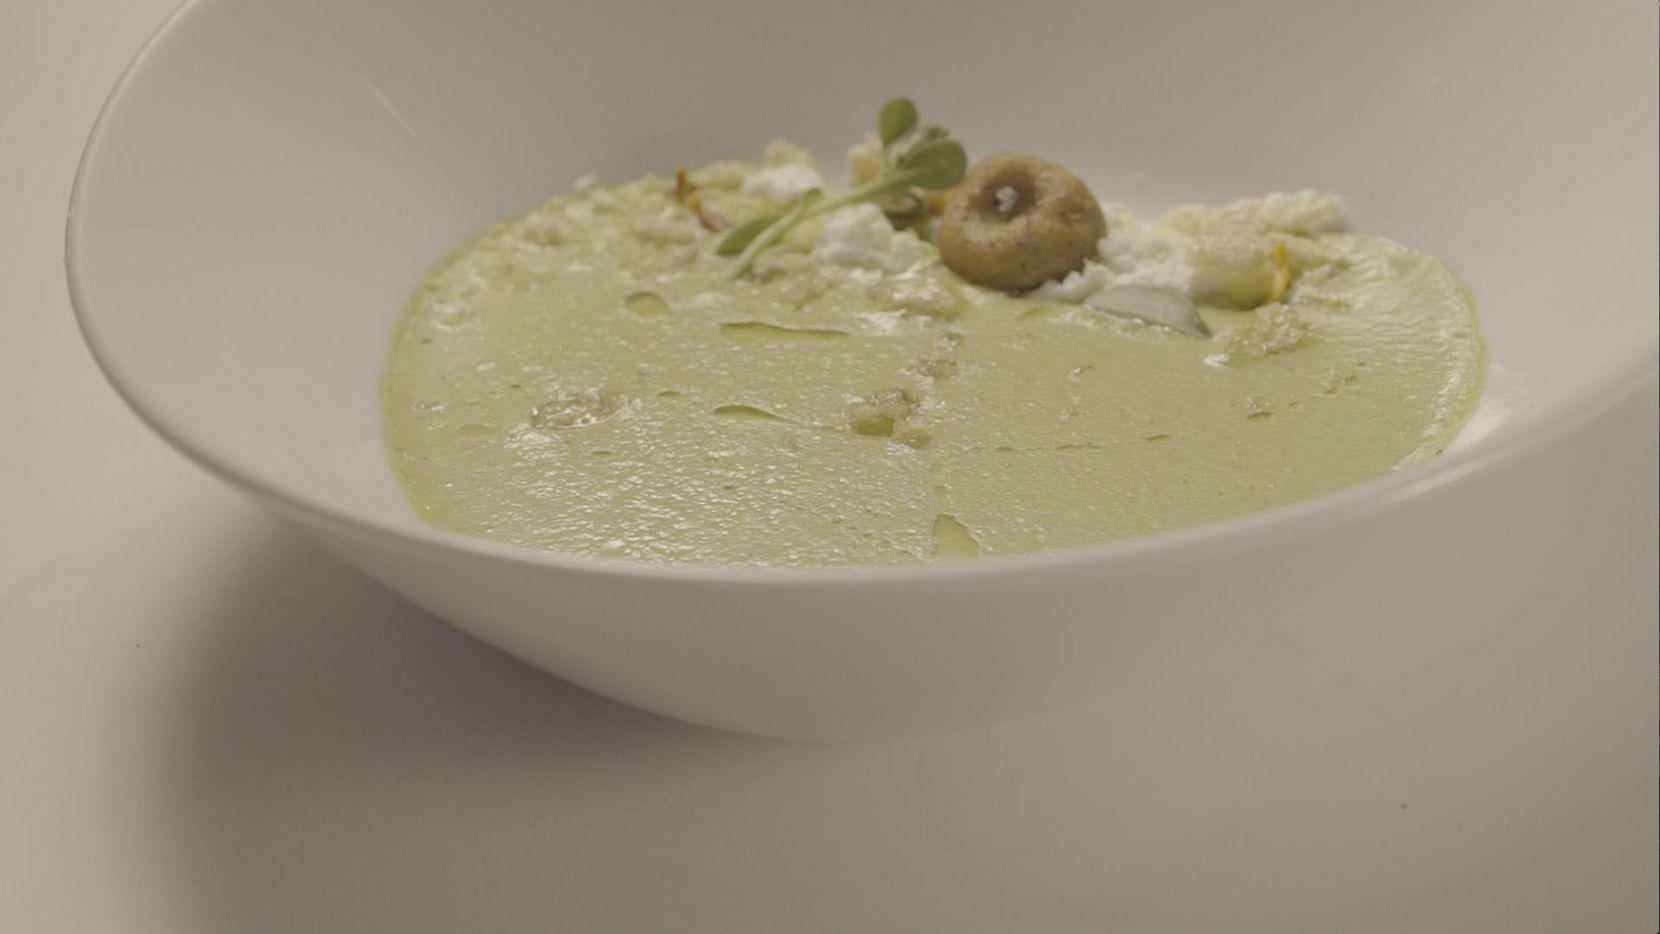 Receta de crema de chile poblano de Adria Marina, de Top Chef México